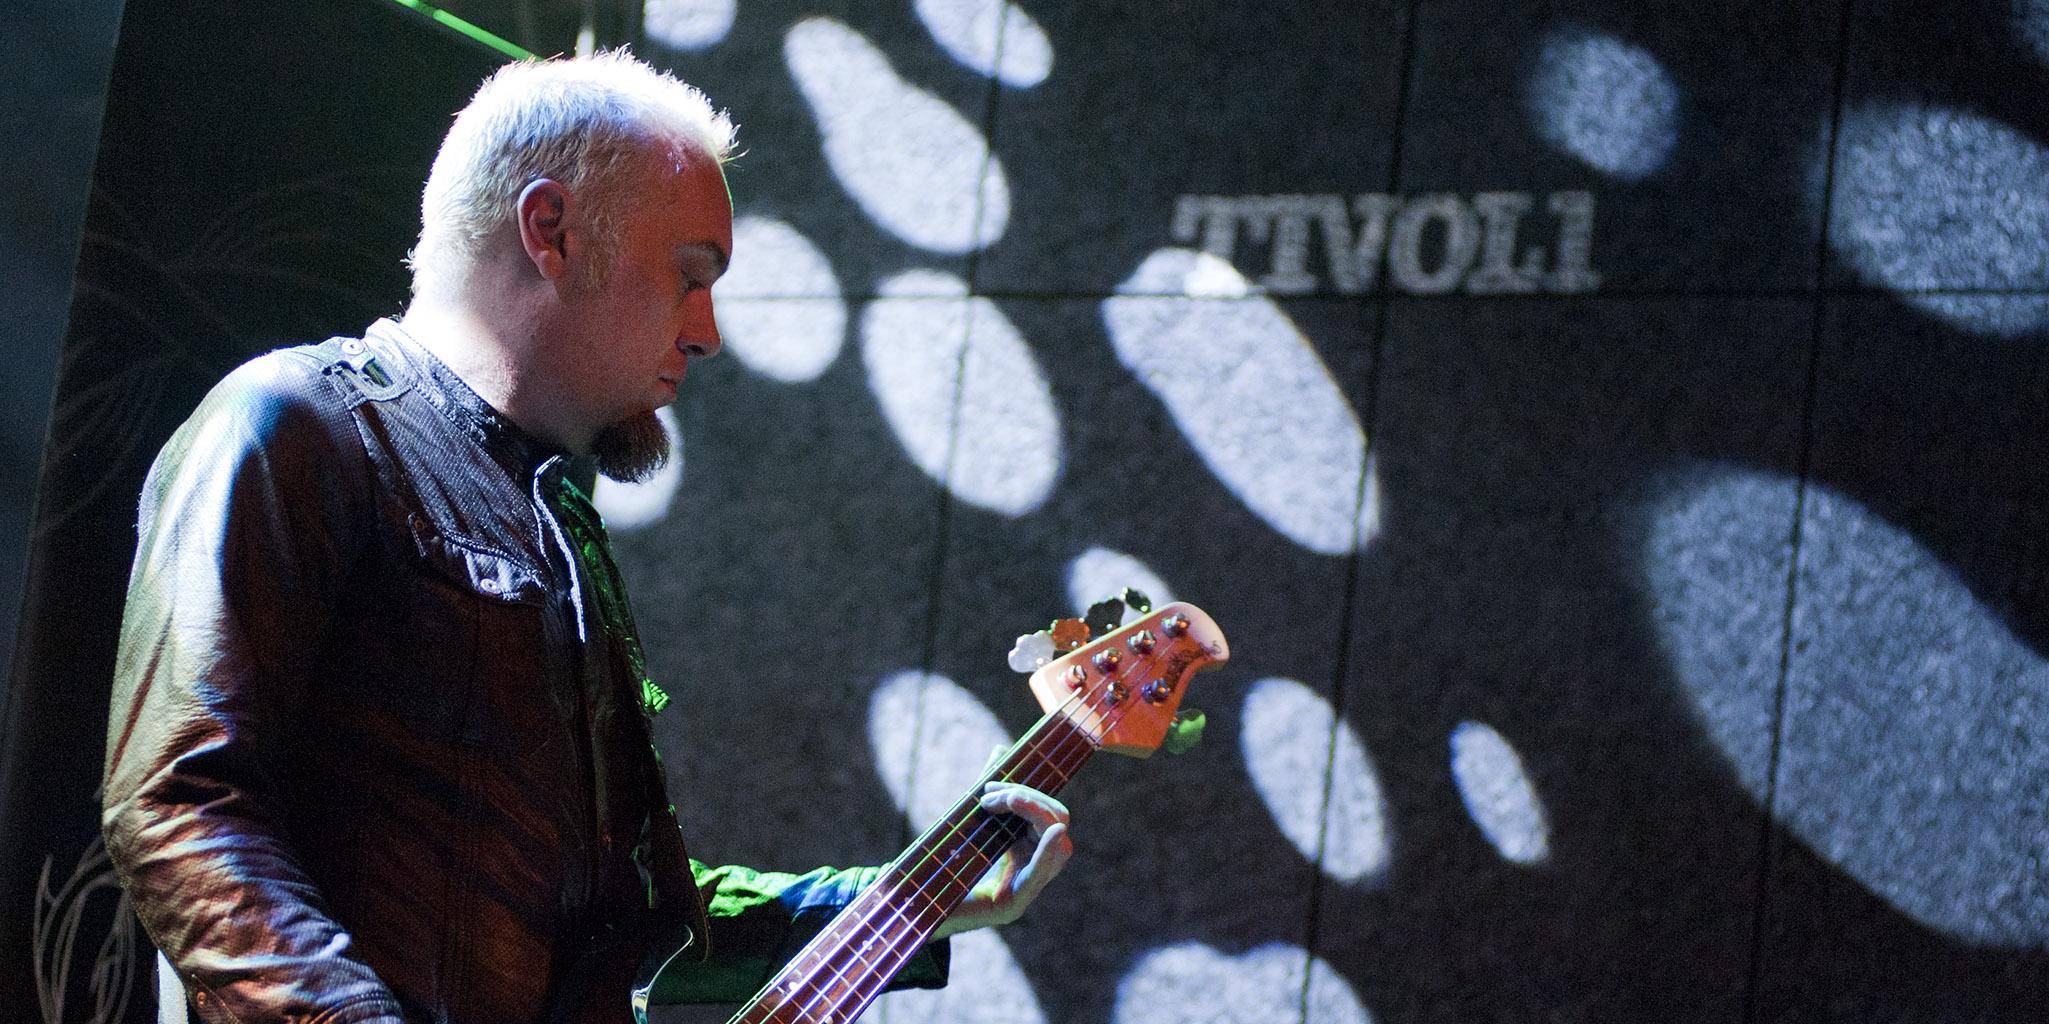 Paradise Lost, Tivoli The Netherlands 5-2-2012